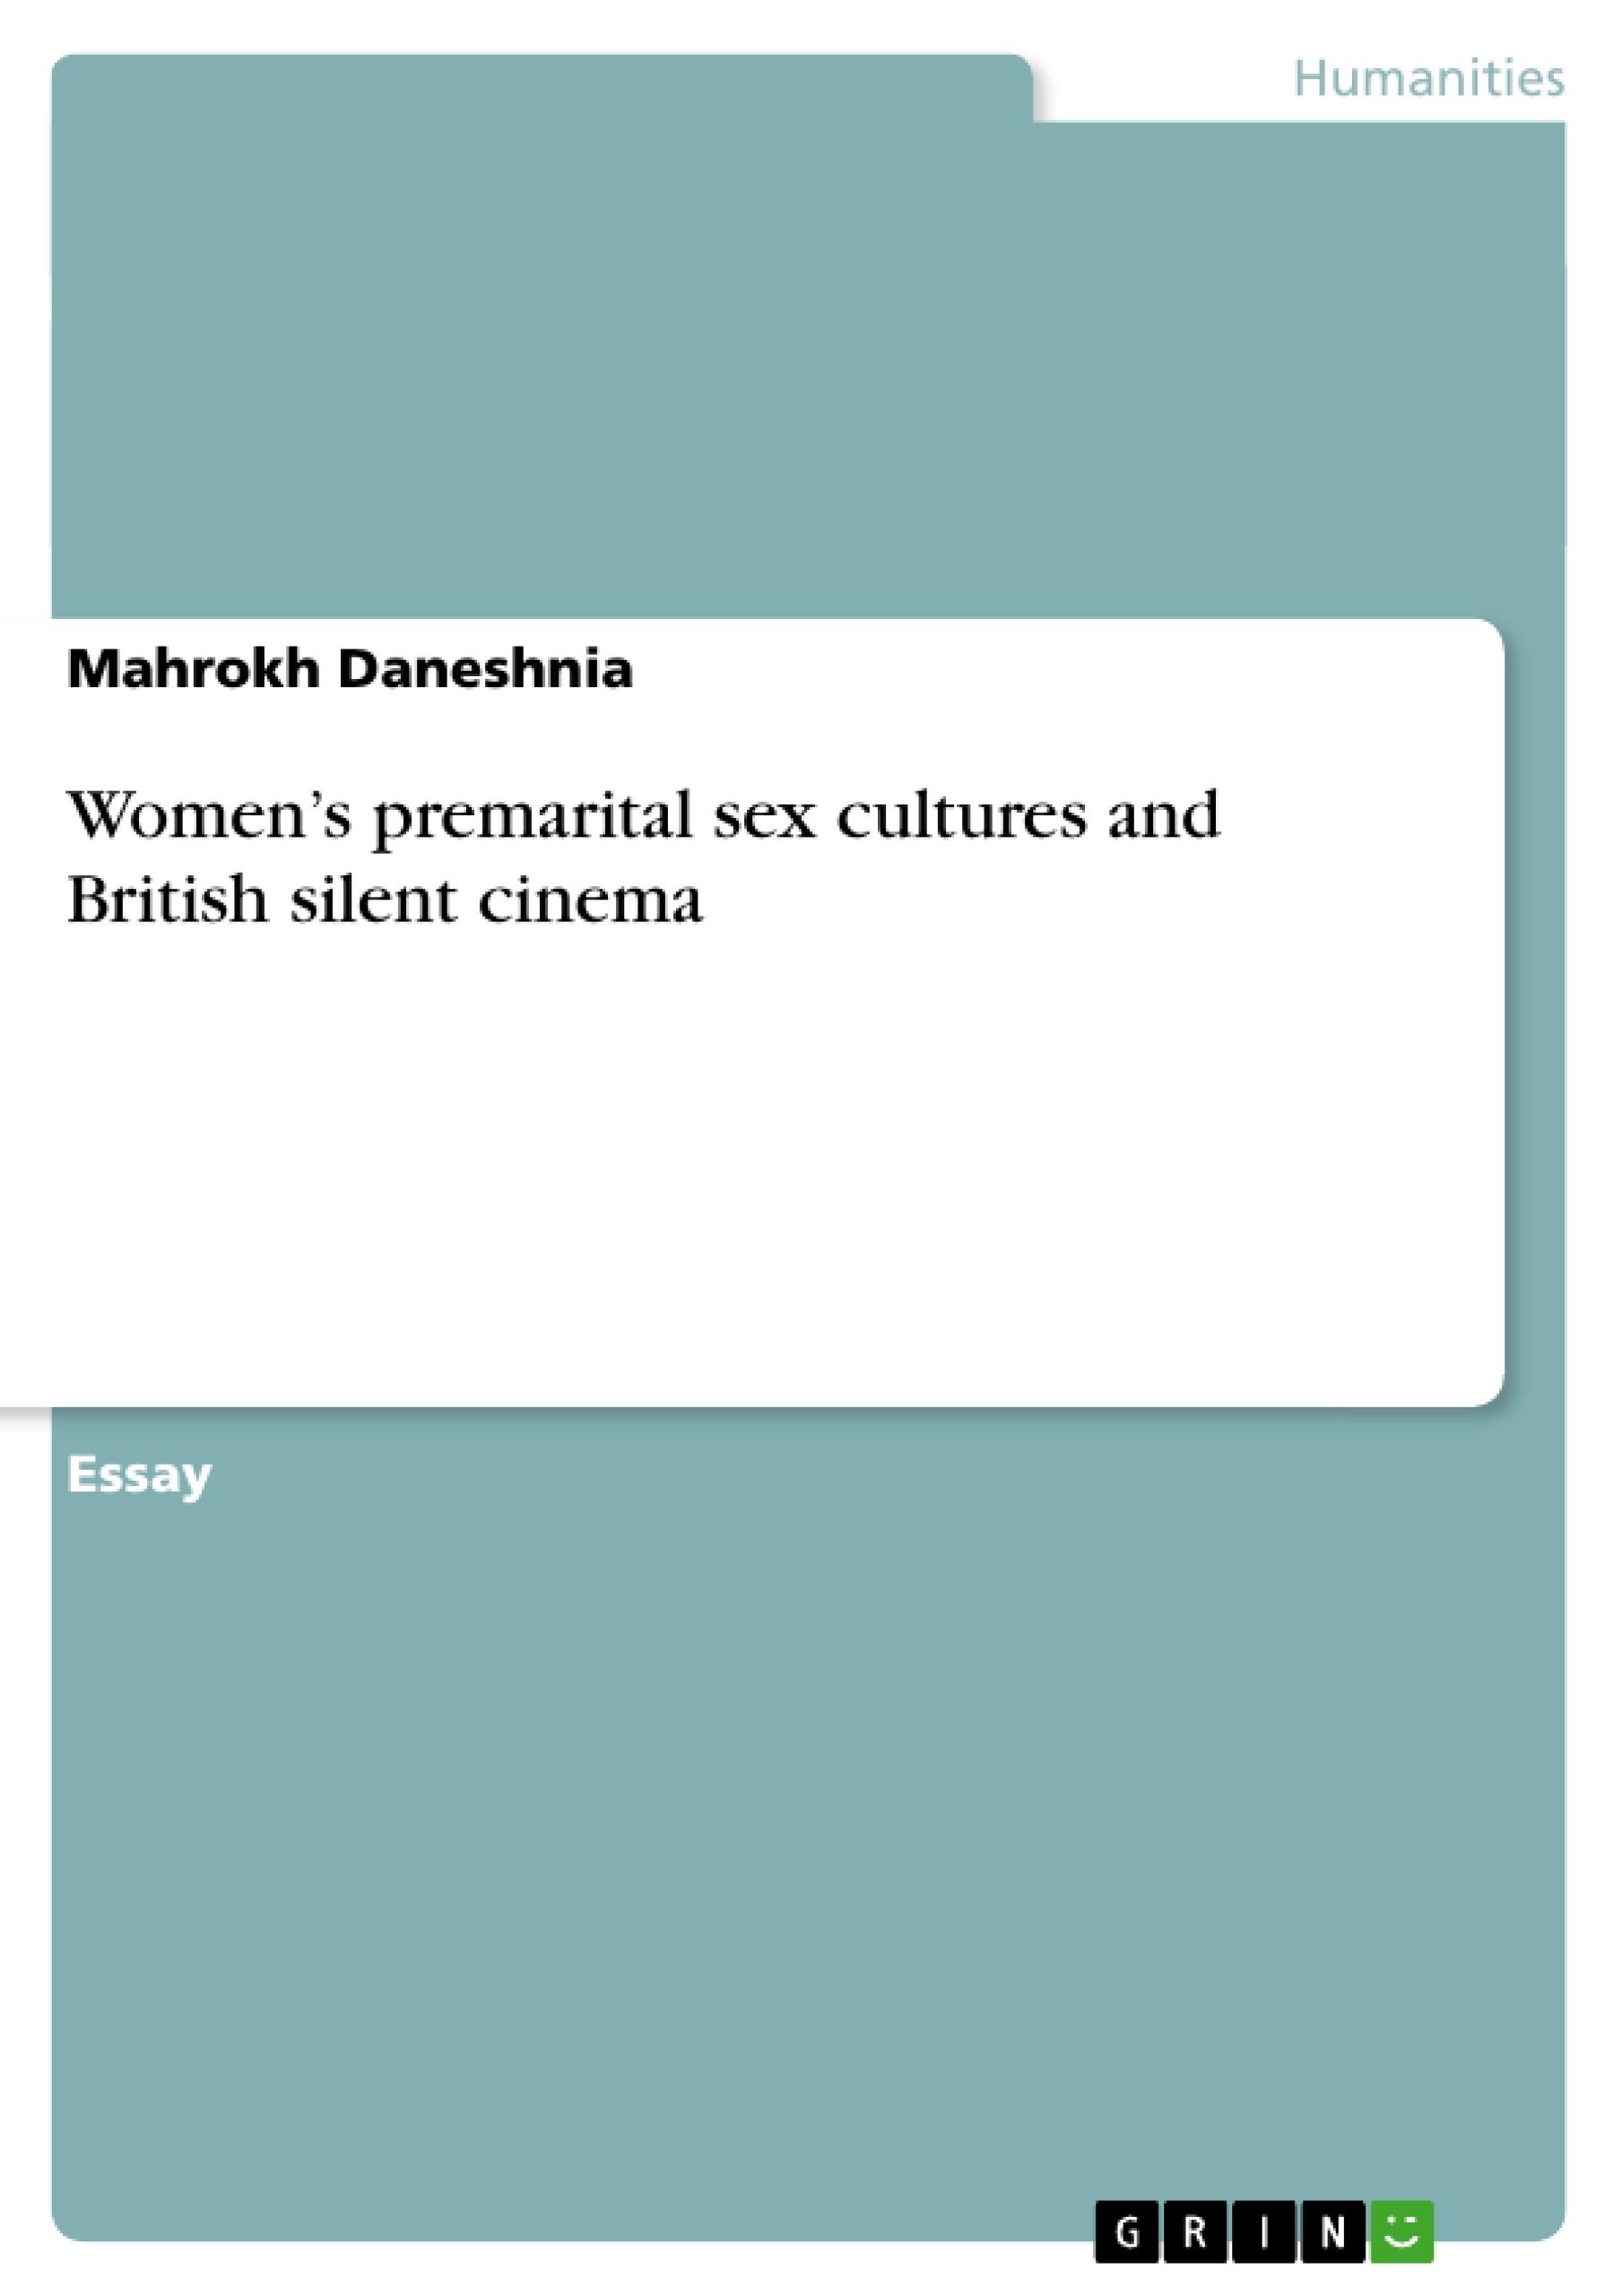 Title: Women's premarital sex cultures and British silent cinema